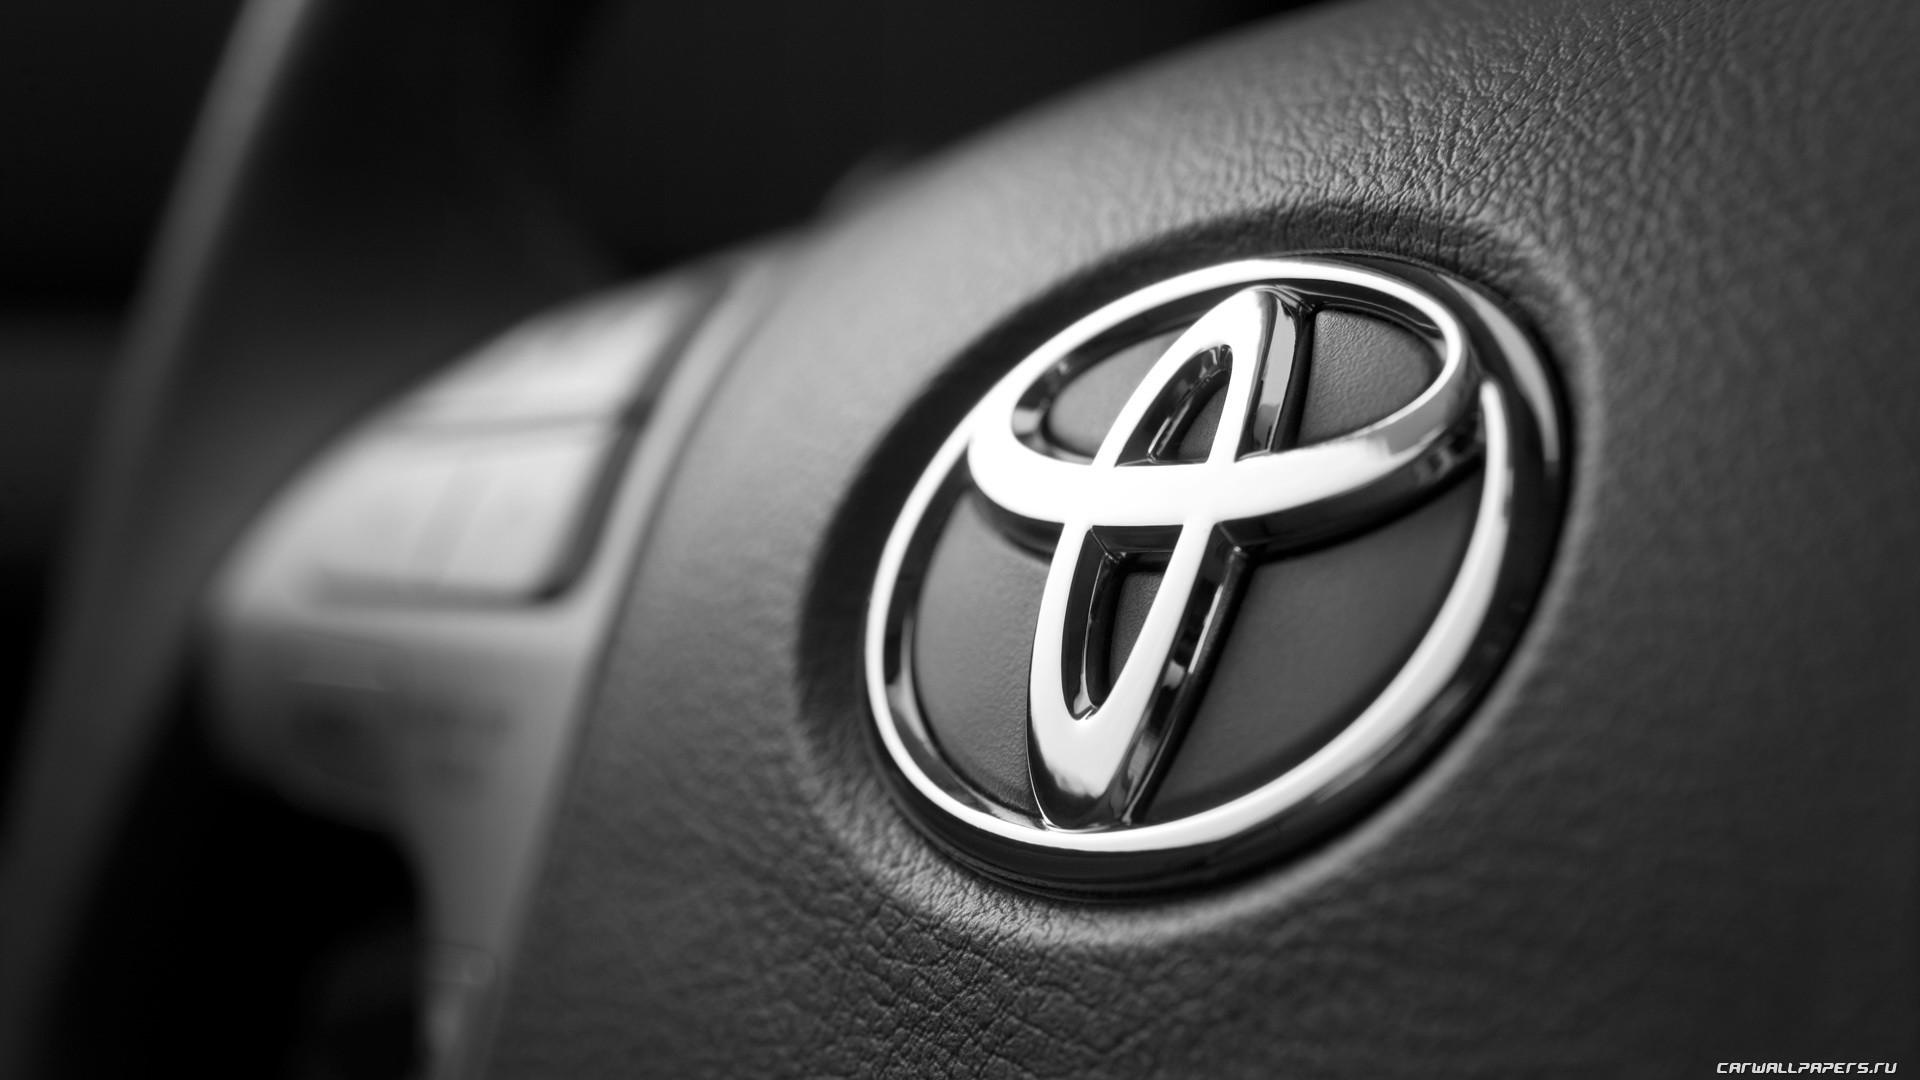 Toyota Logo Wallpaper 55 images 1920x1080